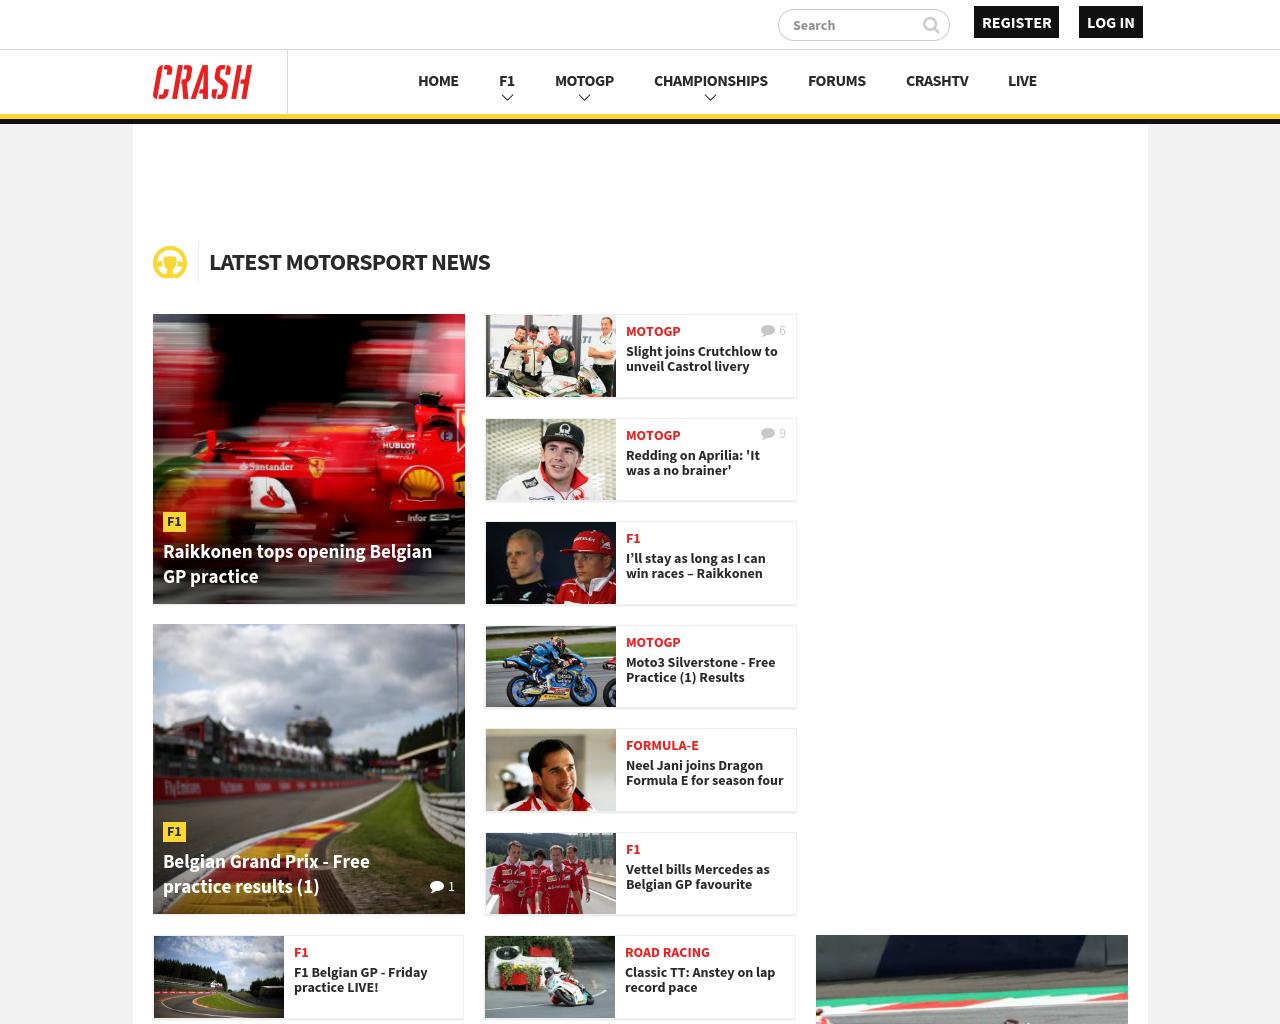 Crash-Media-Group-Advertising-Reviews-Pricing